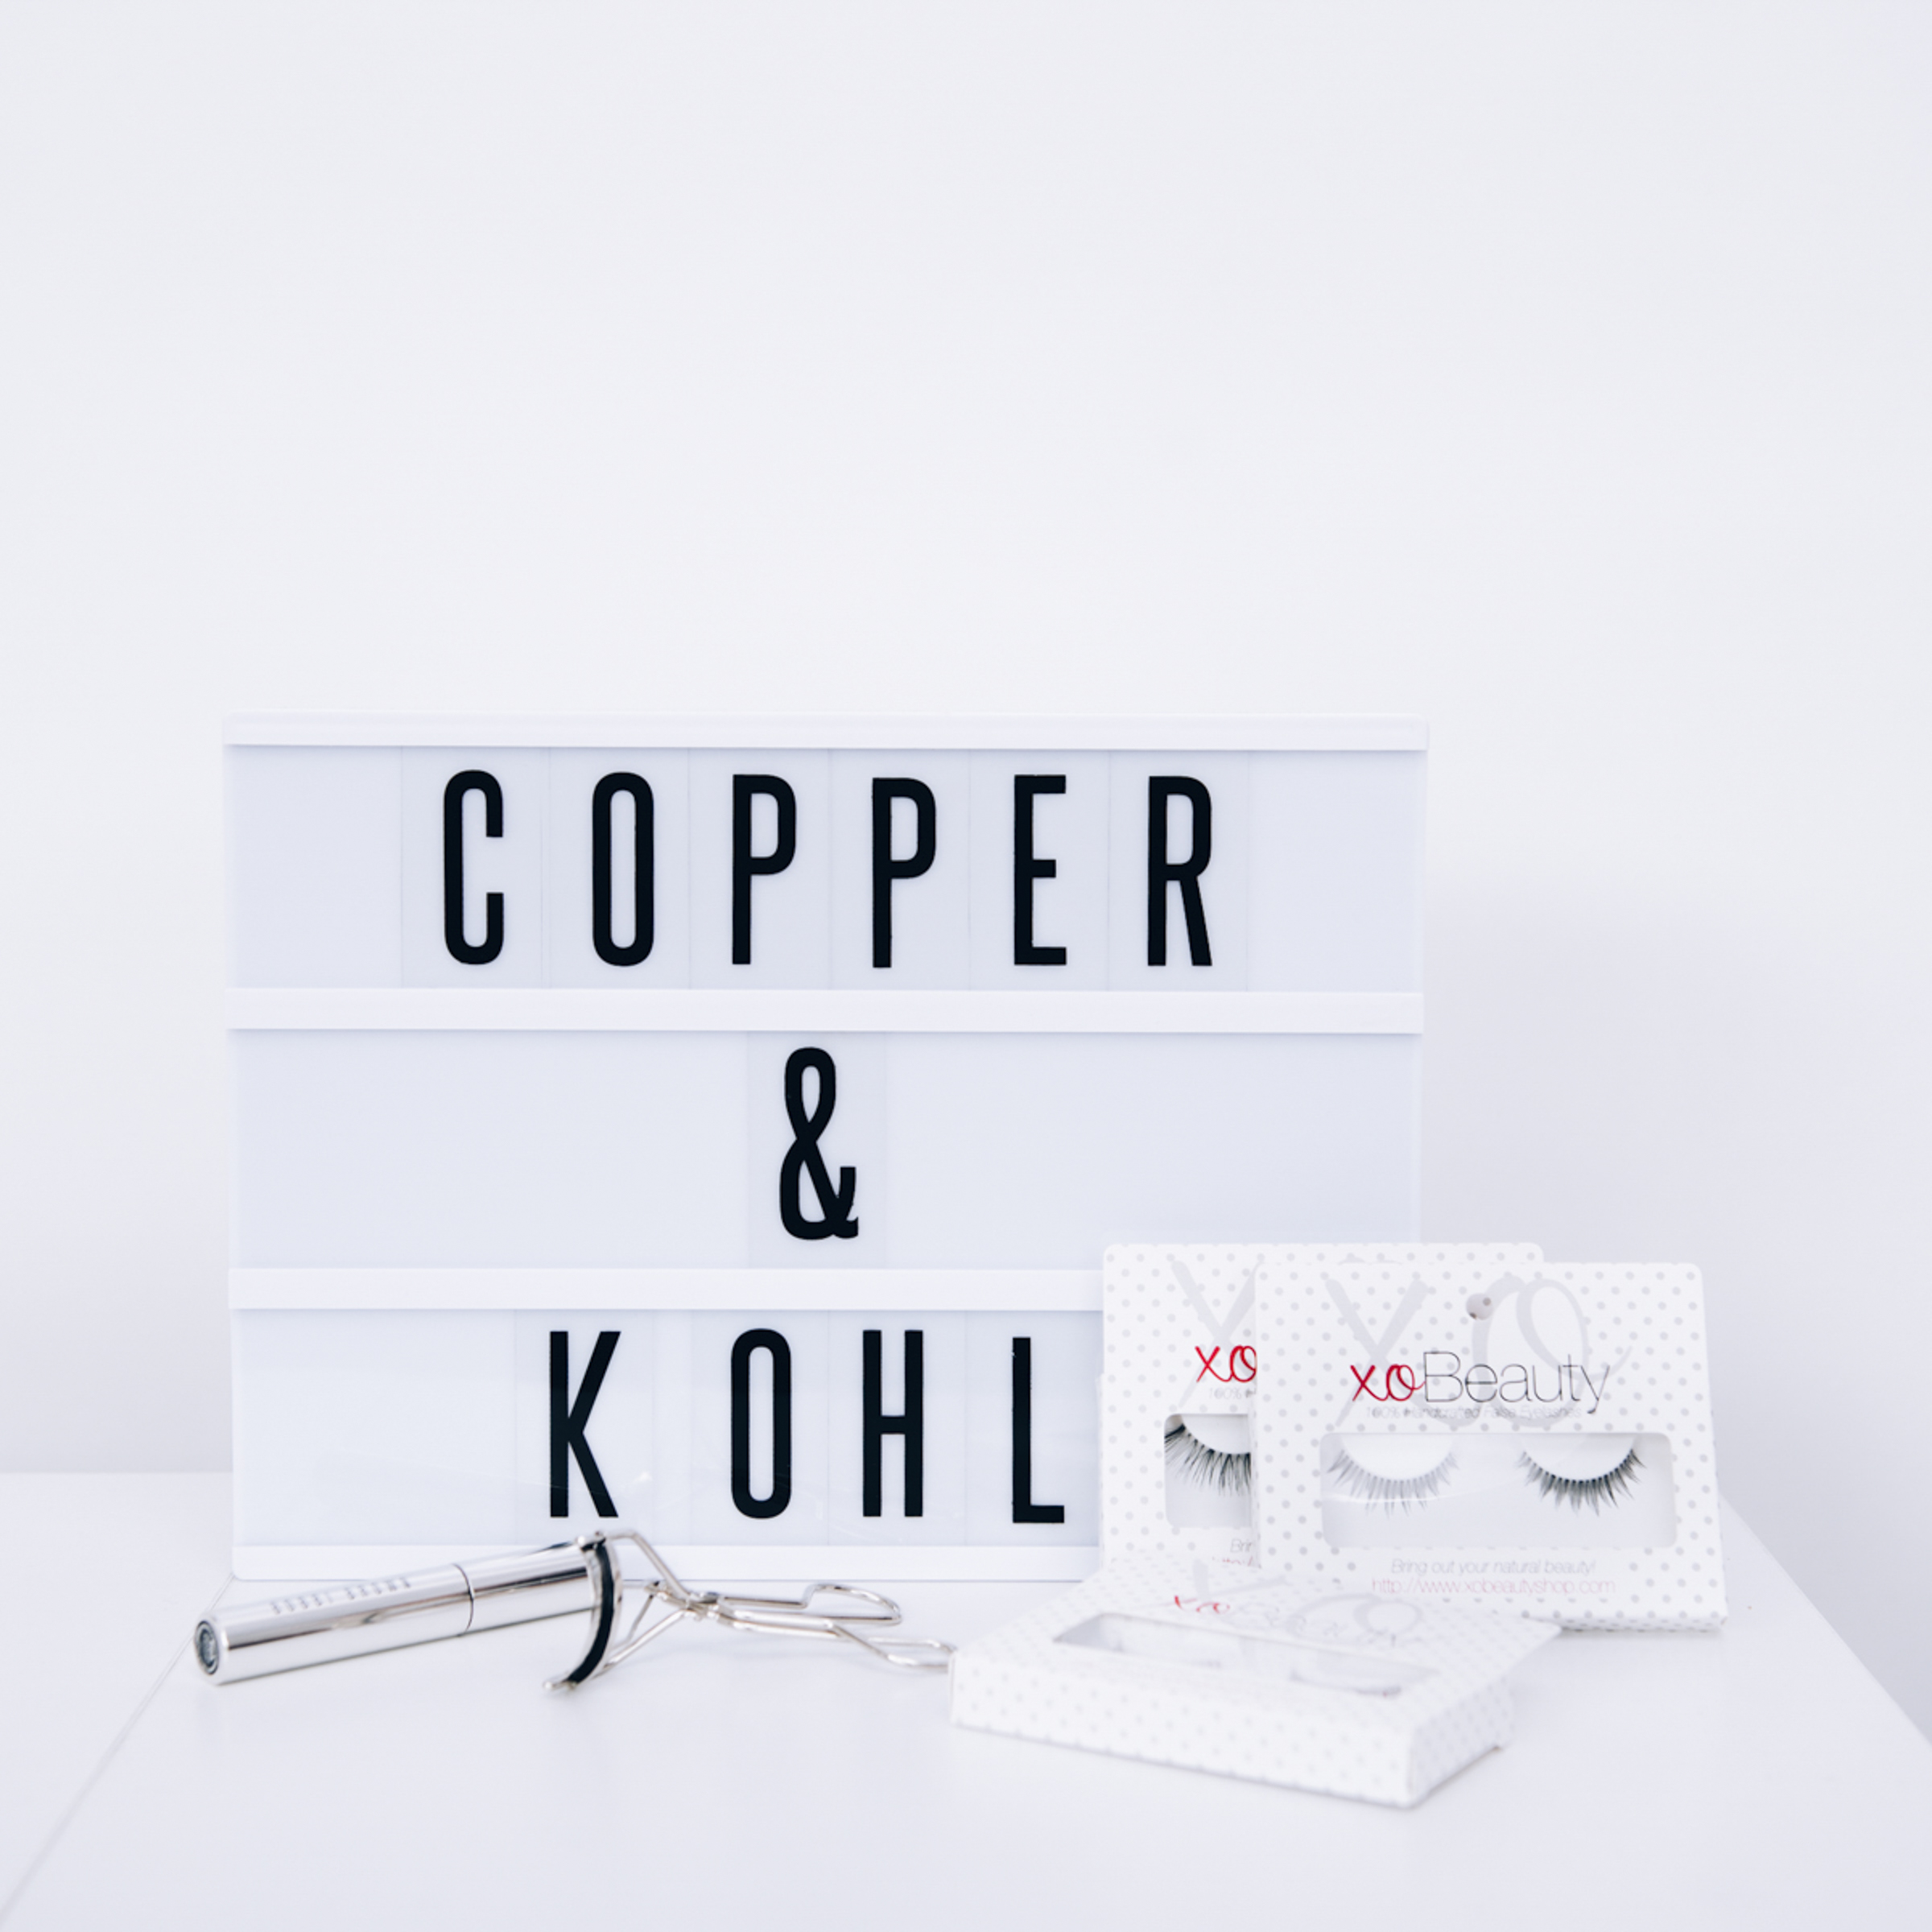 Copper & Kohl 2 Lola Photography_133.jpg